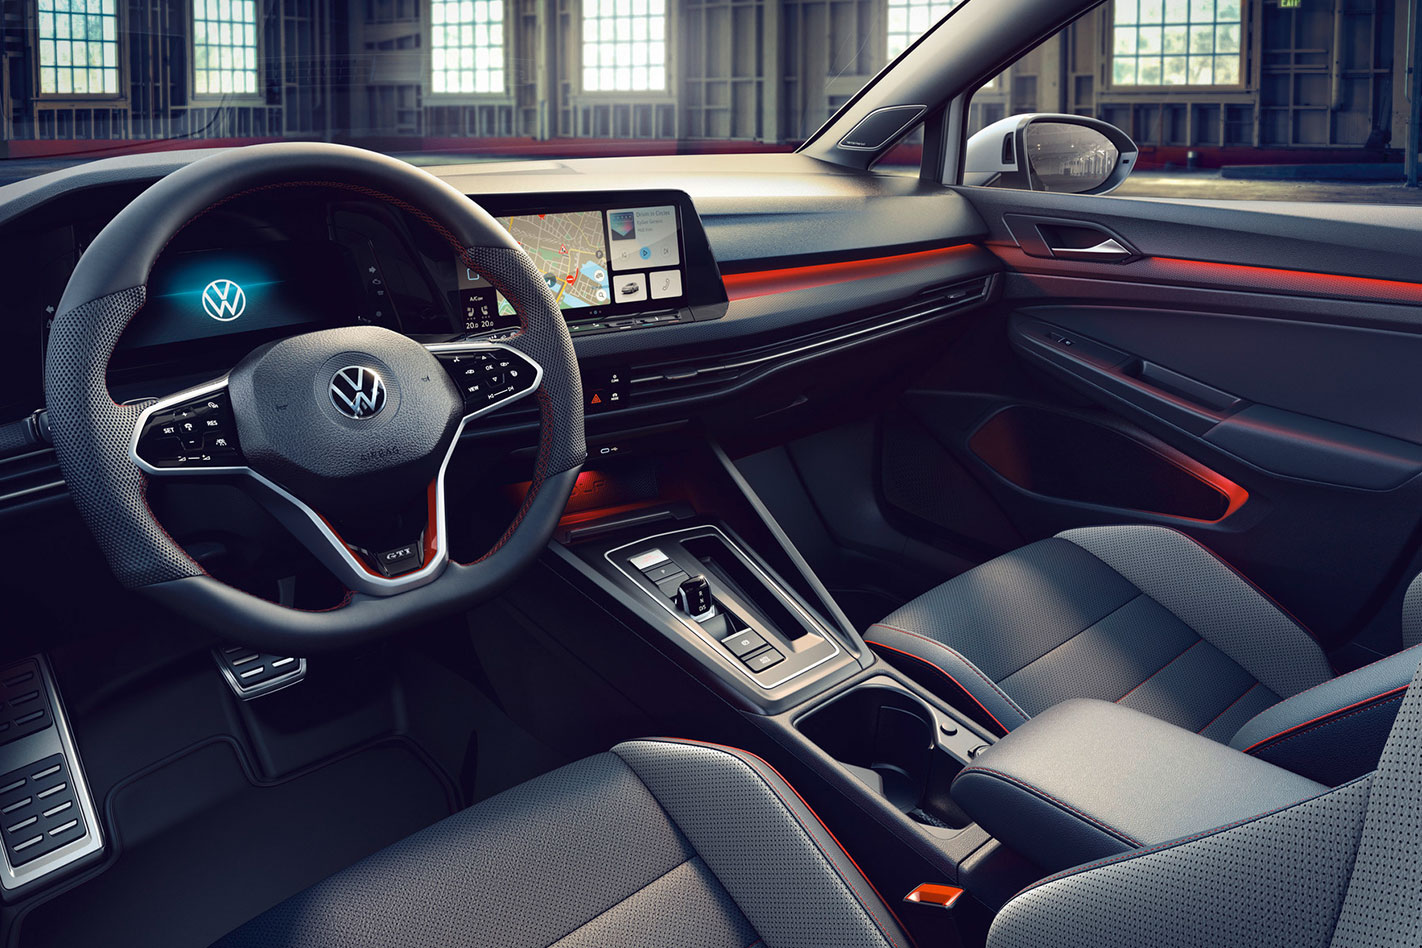 2020 VW Golf GTI Clubsport interior